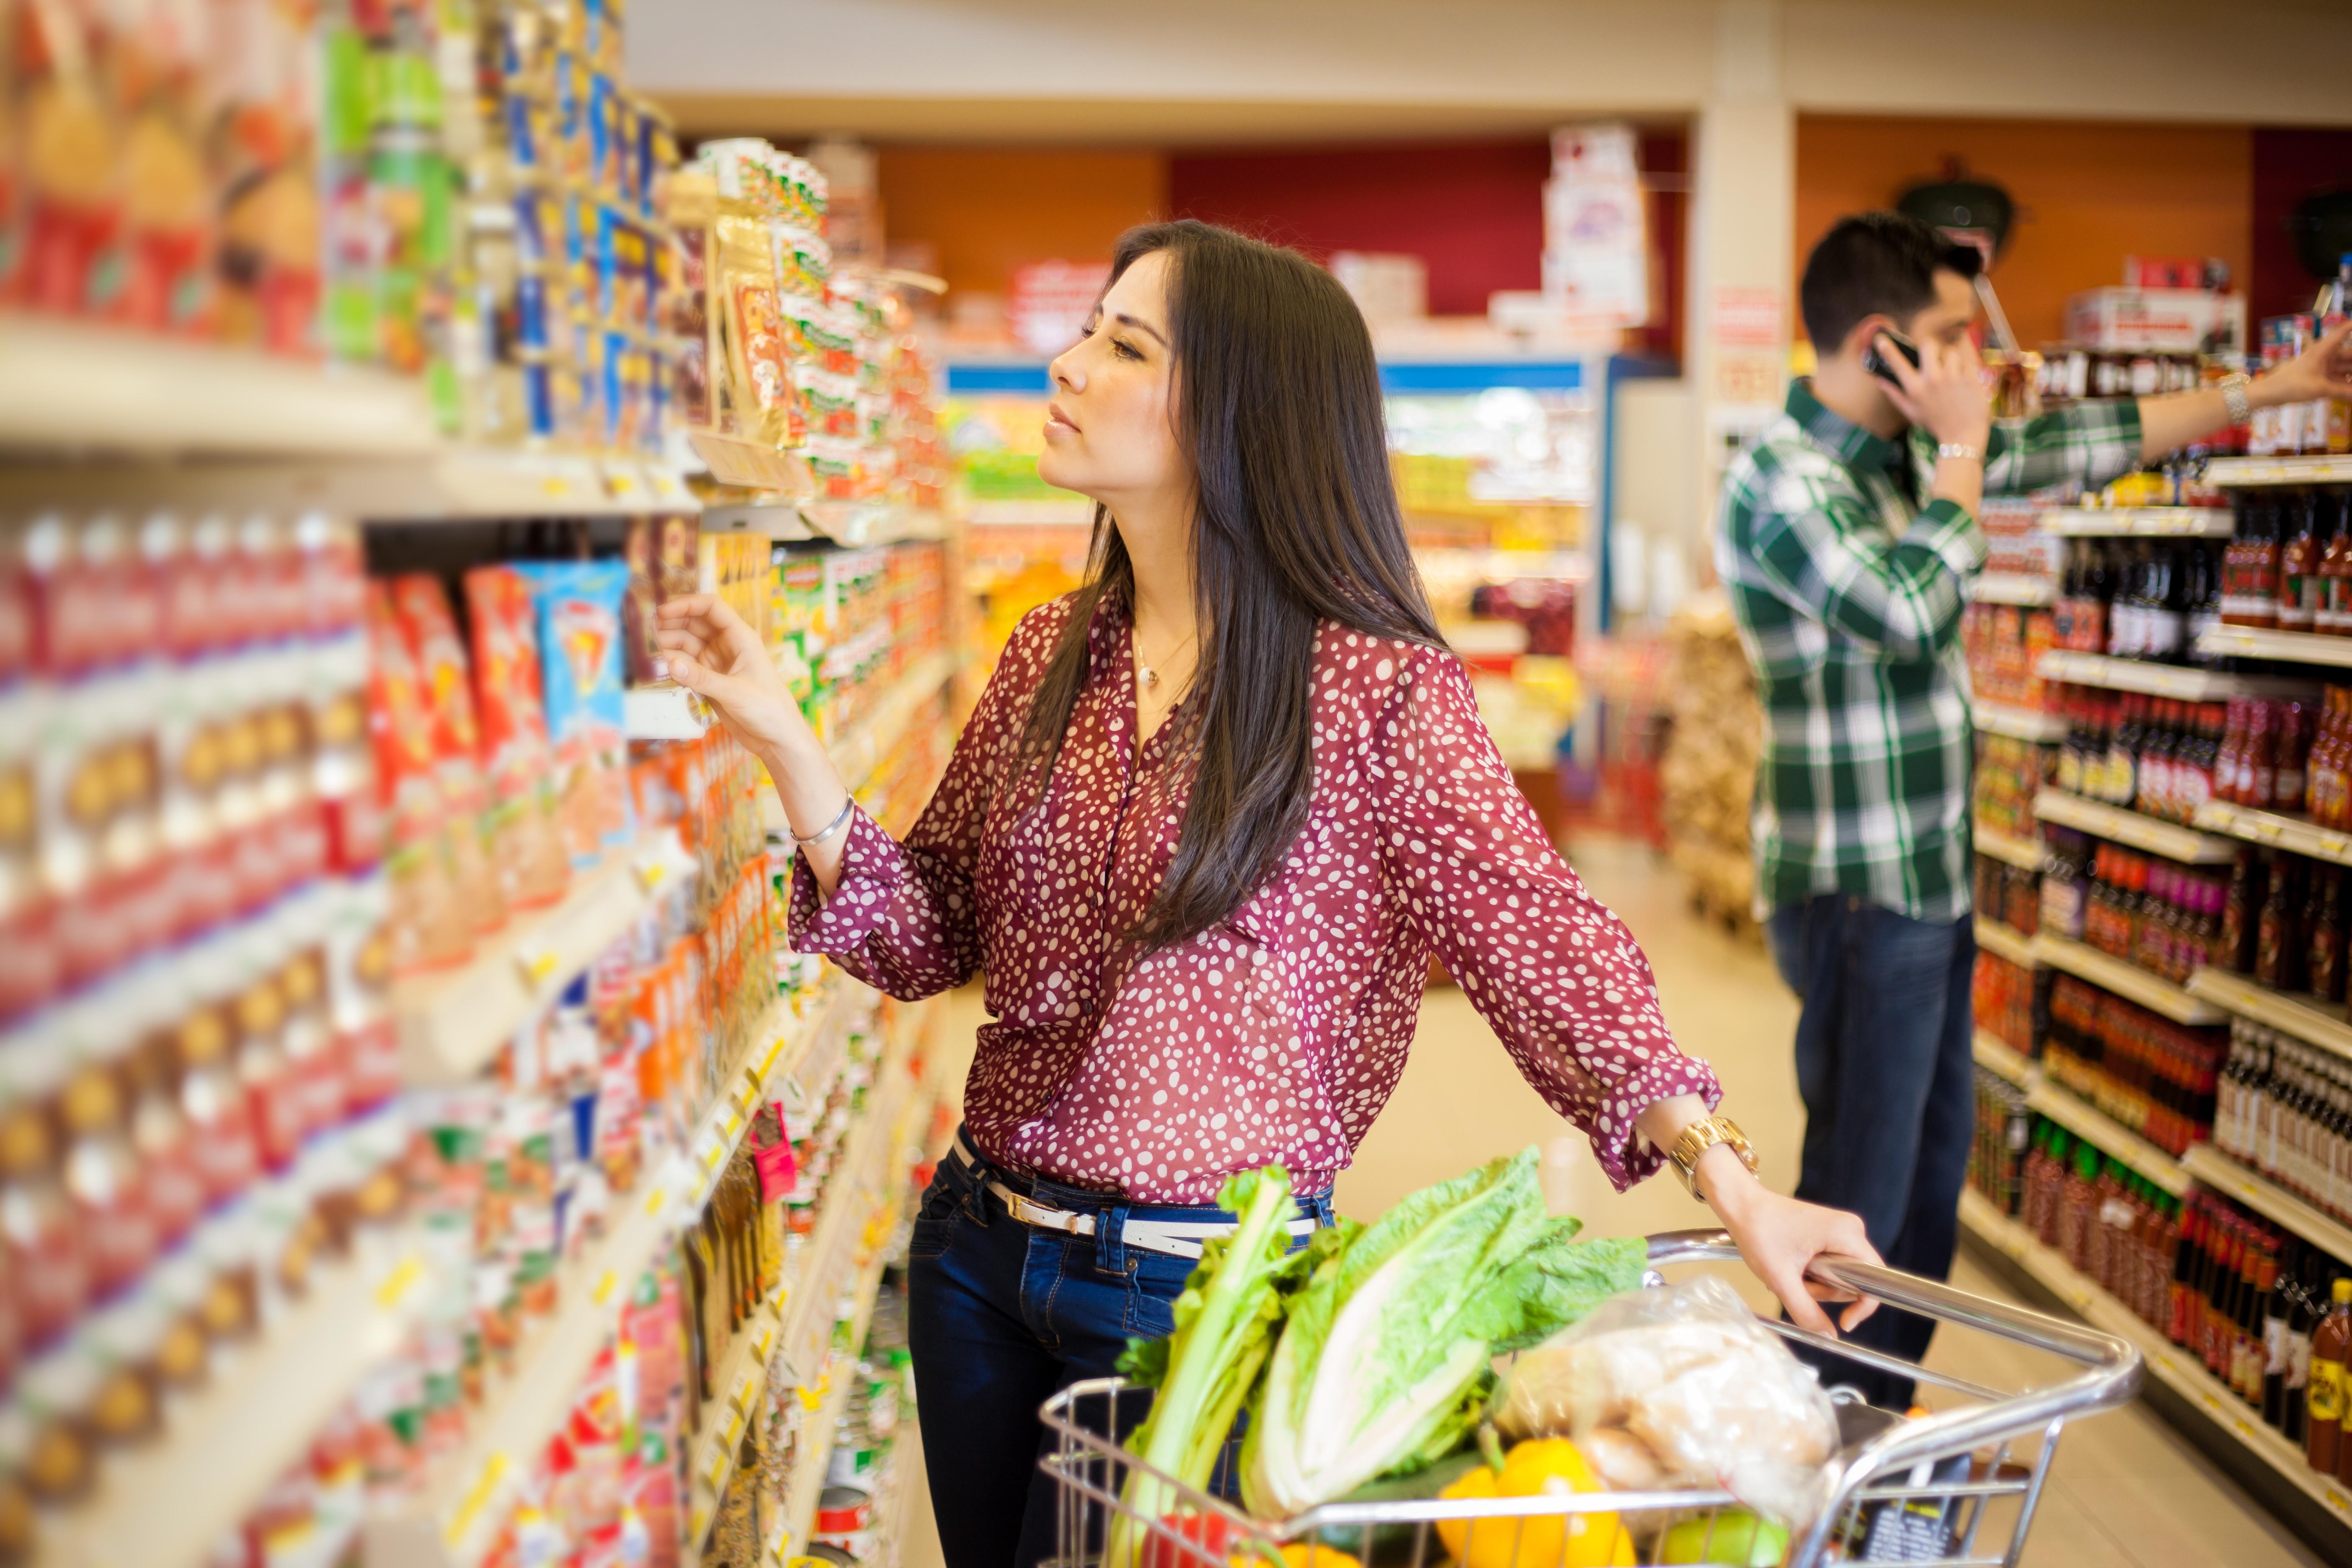 10 Easy Shopping Hacks to Maximize Savings Everyday